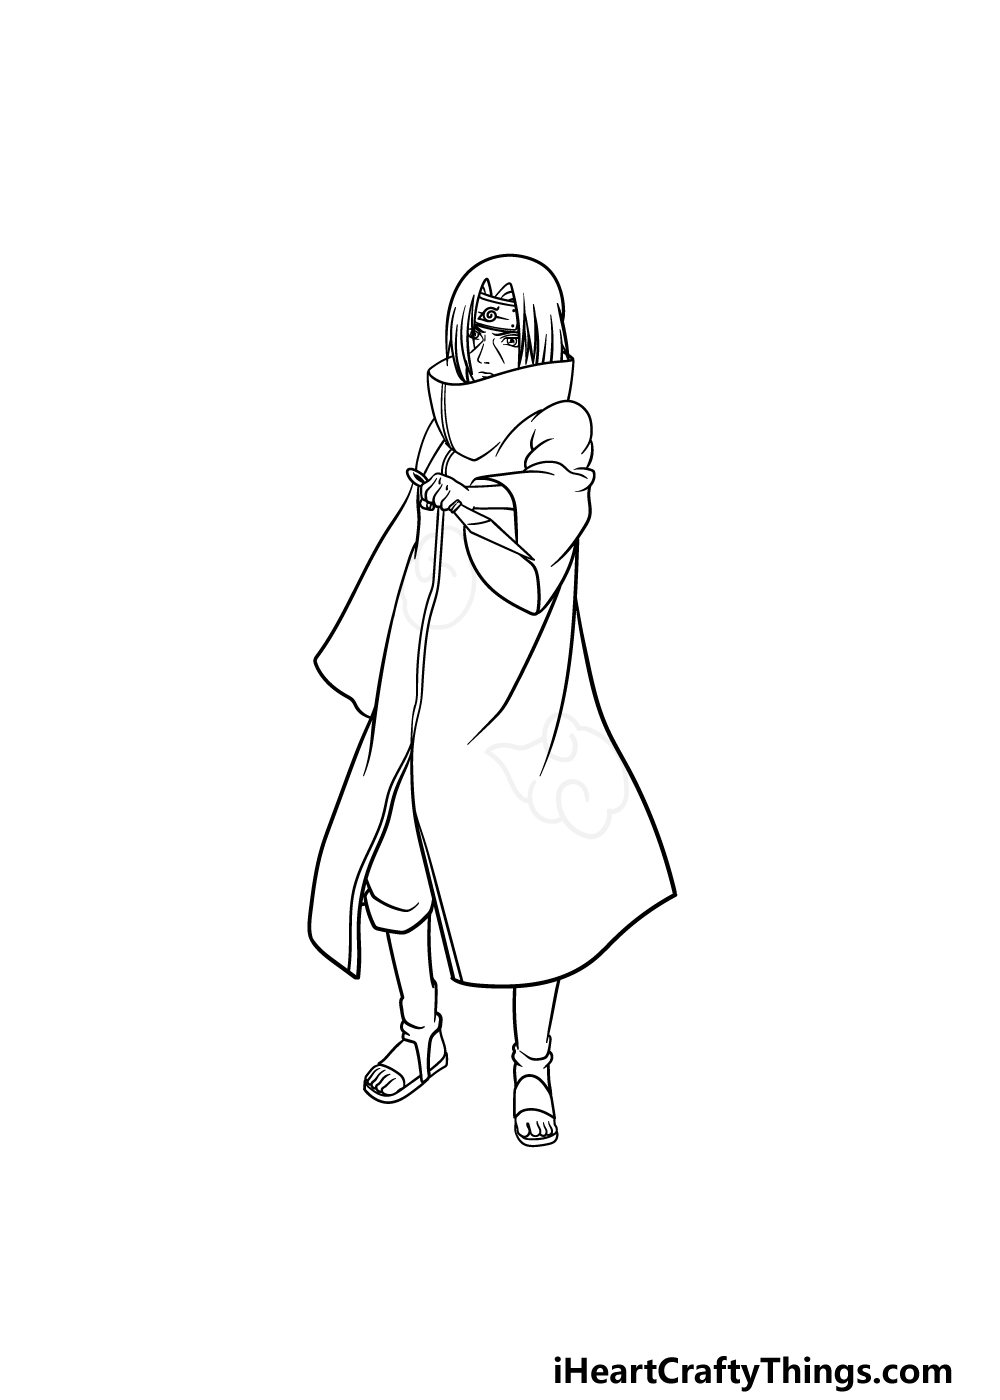 drawing Itachi step 5